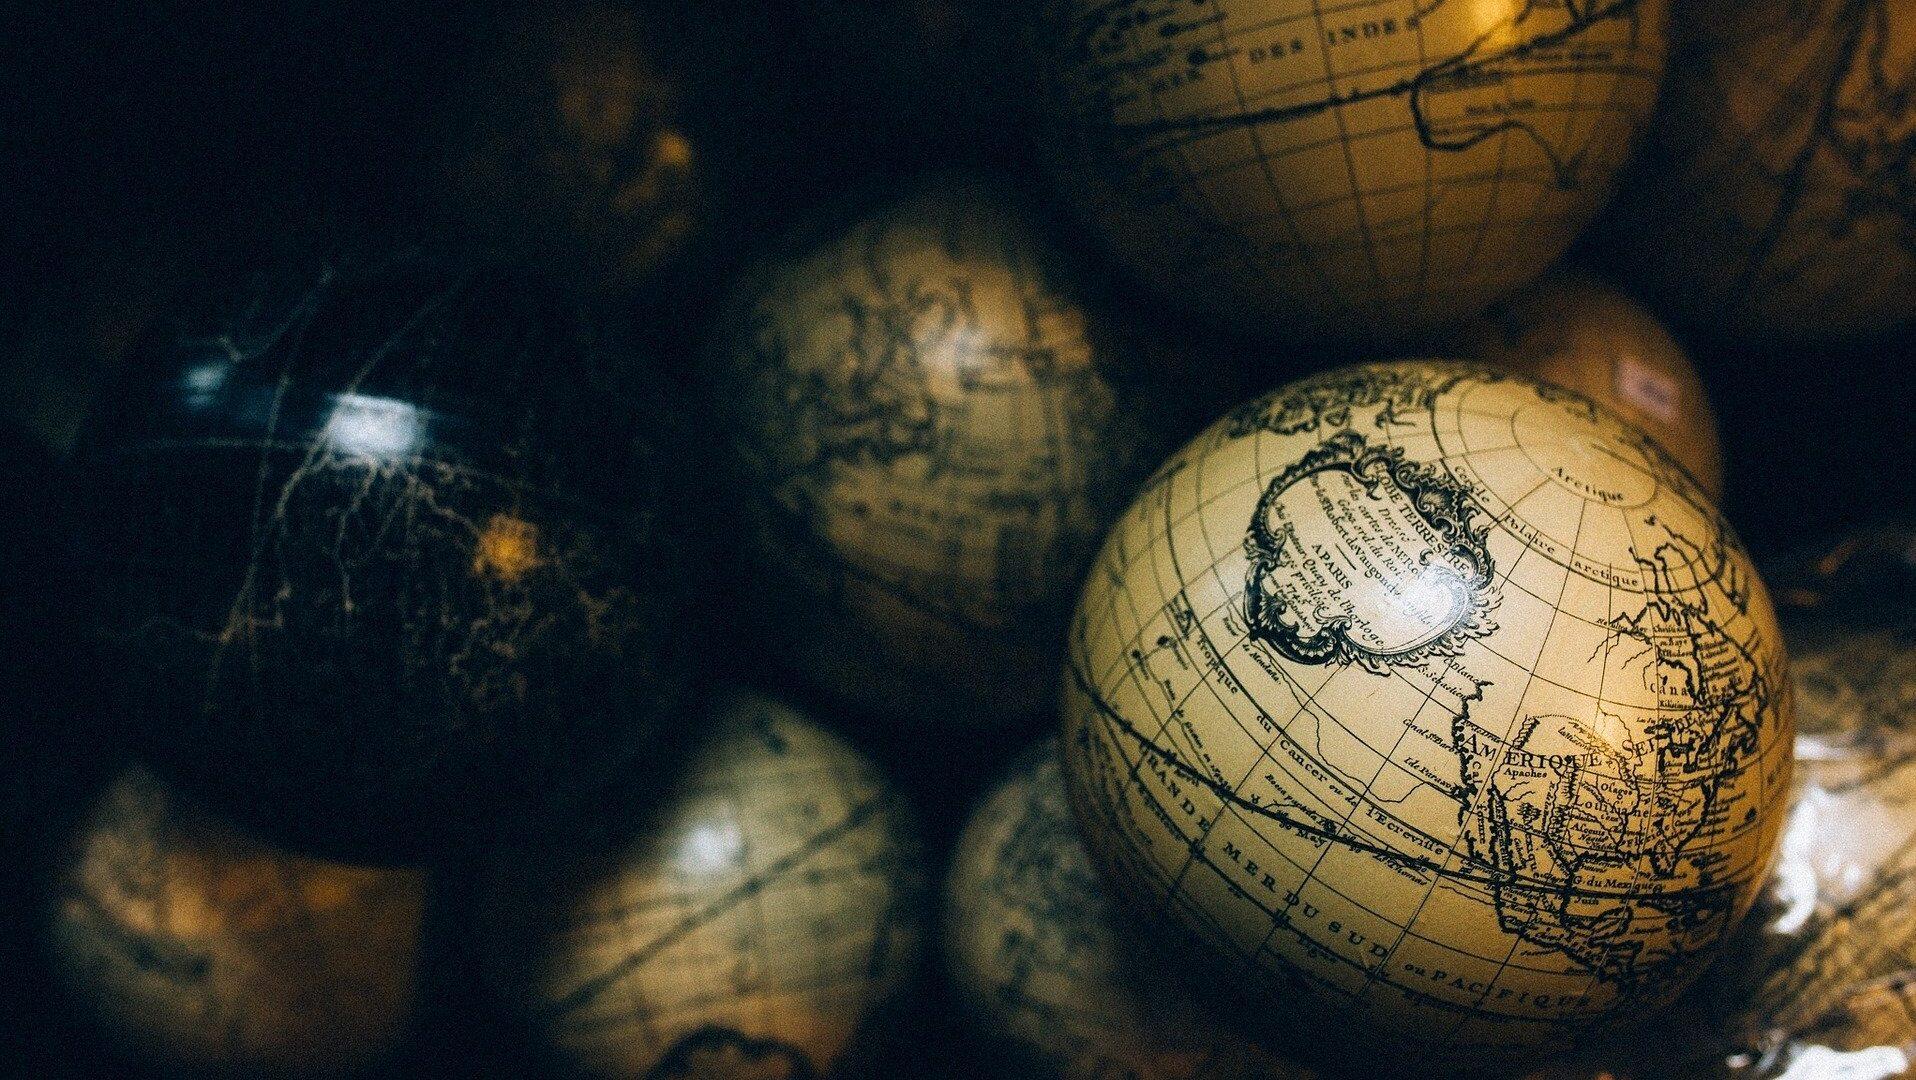 globes-1246245_1920.jpg